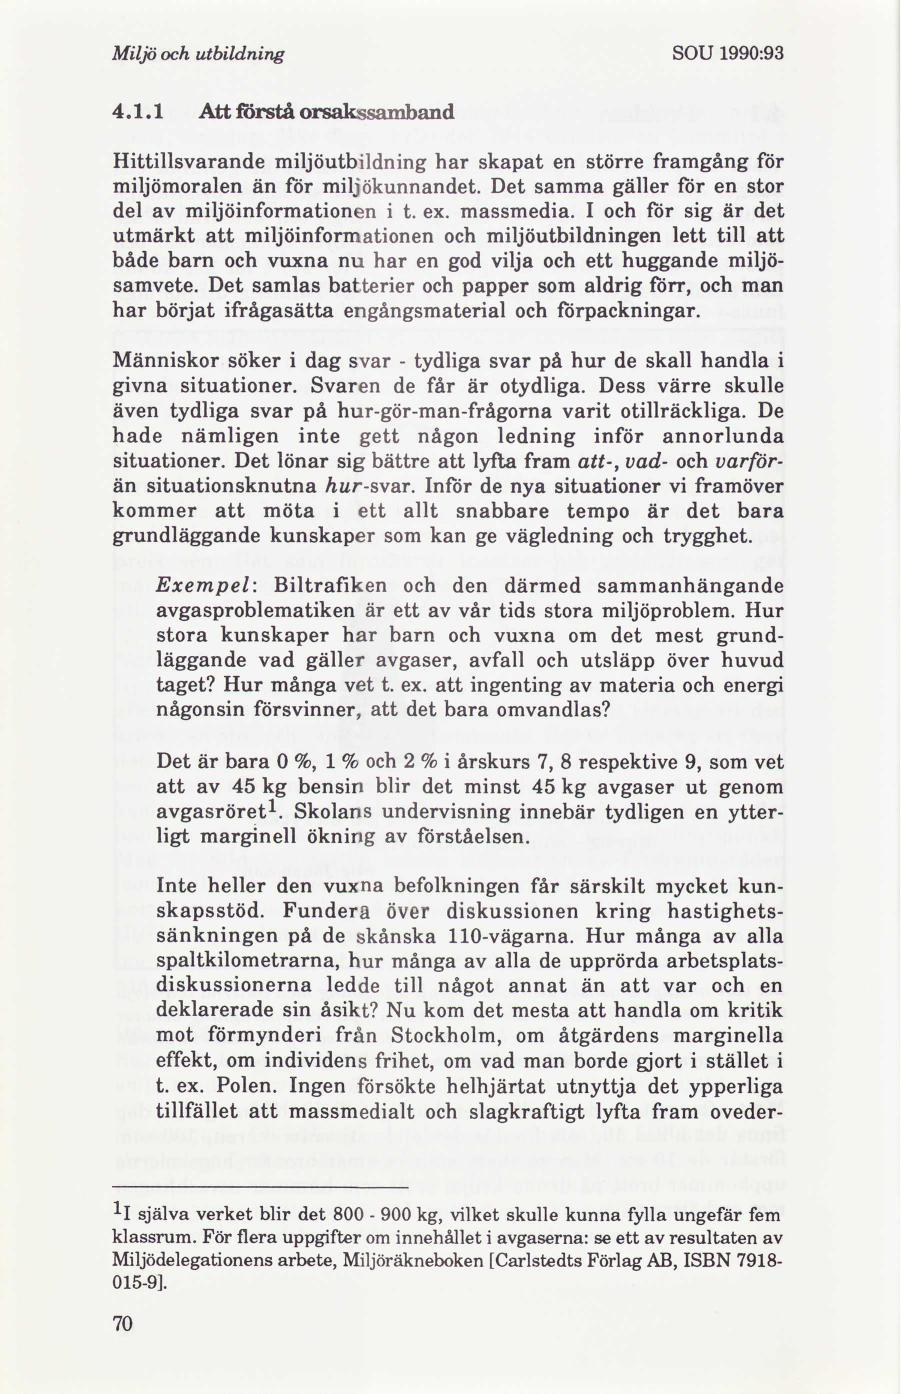 Miljön i västra Skåne   år 2000 i våra händer  727e266c4eb78